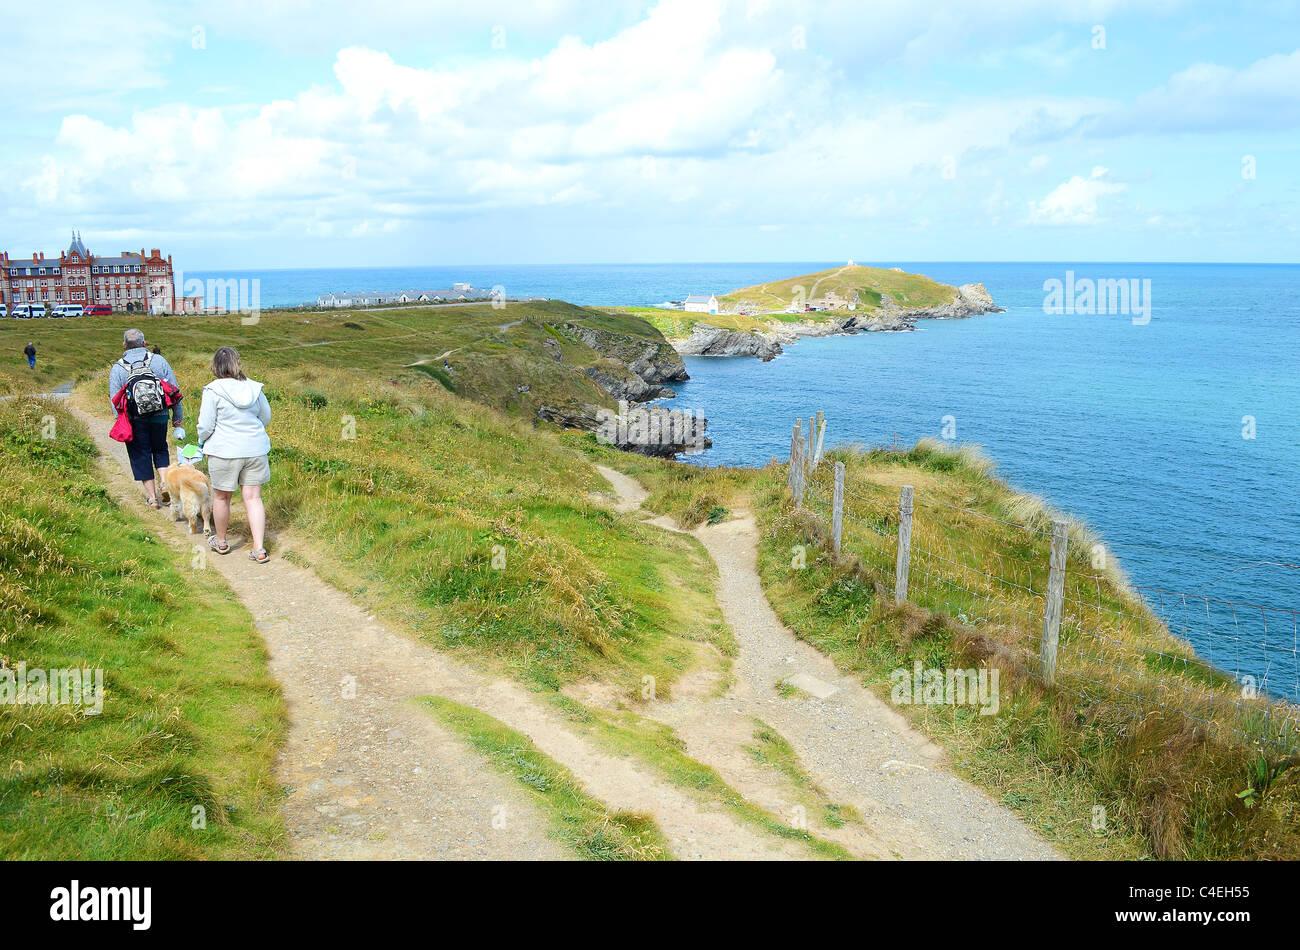 people walking the south west coast path on towan head, newquay, cornwall, uk - Stock Image